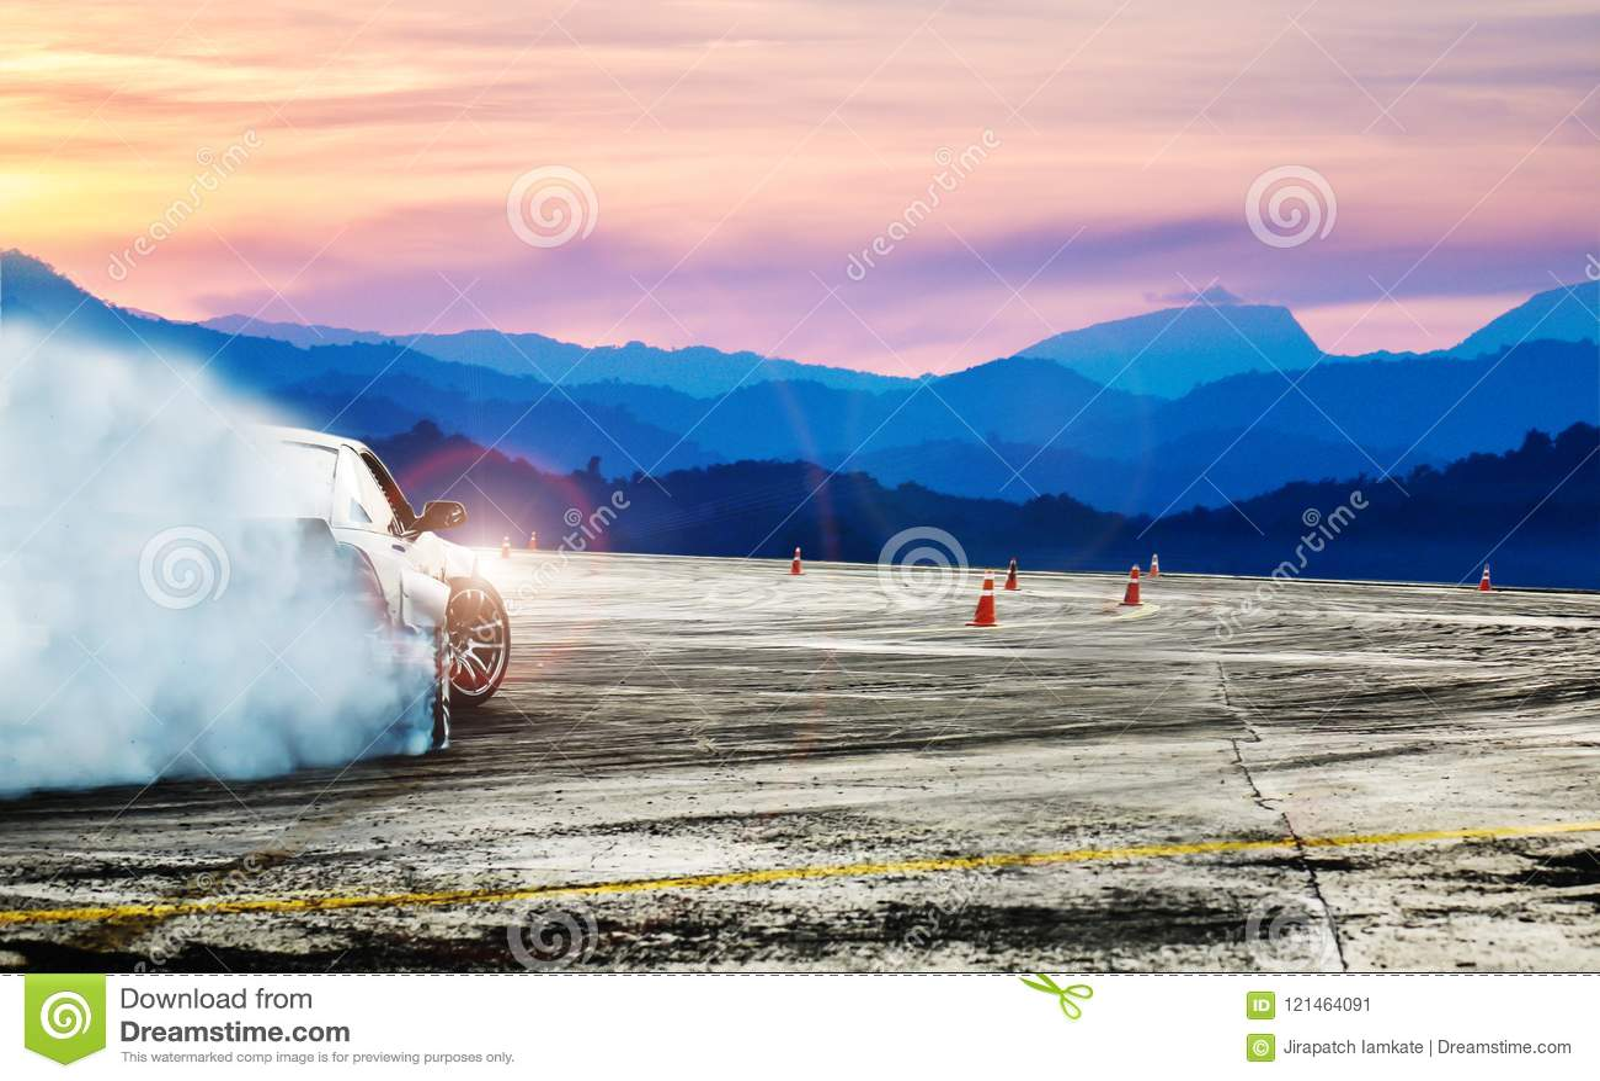 Dramatic car drifting, Blurred of image diffusion race drift car